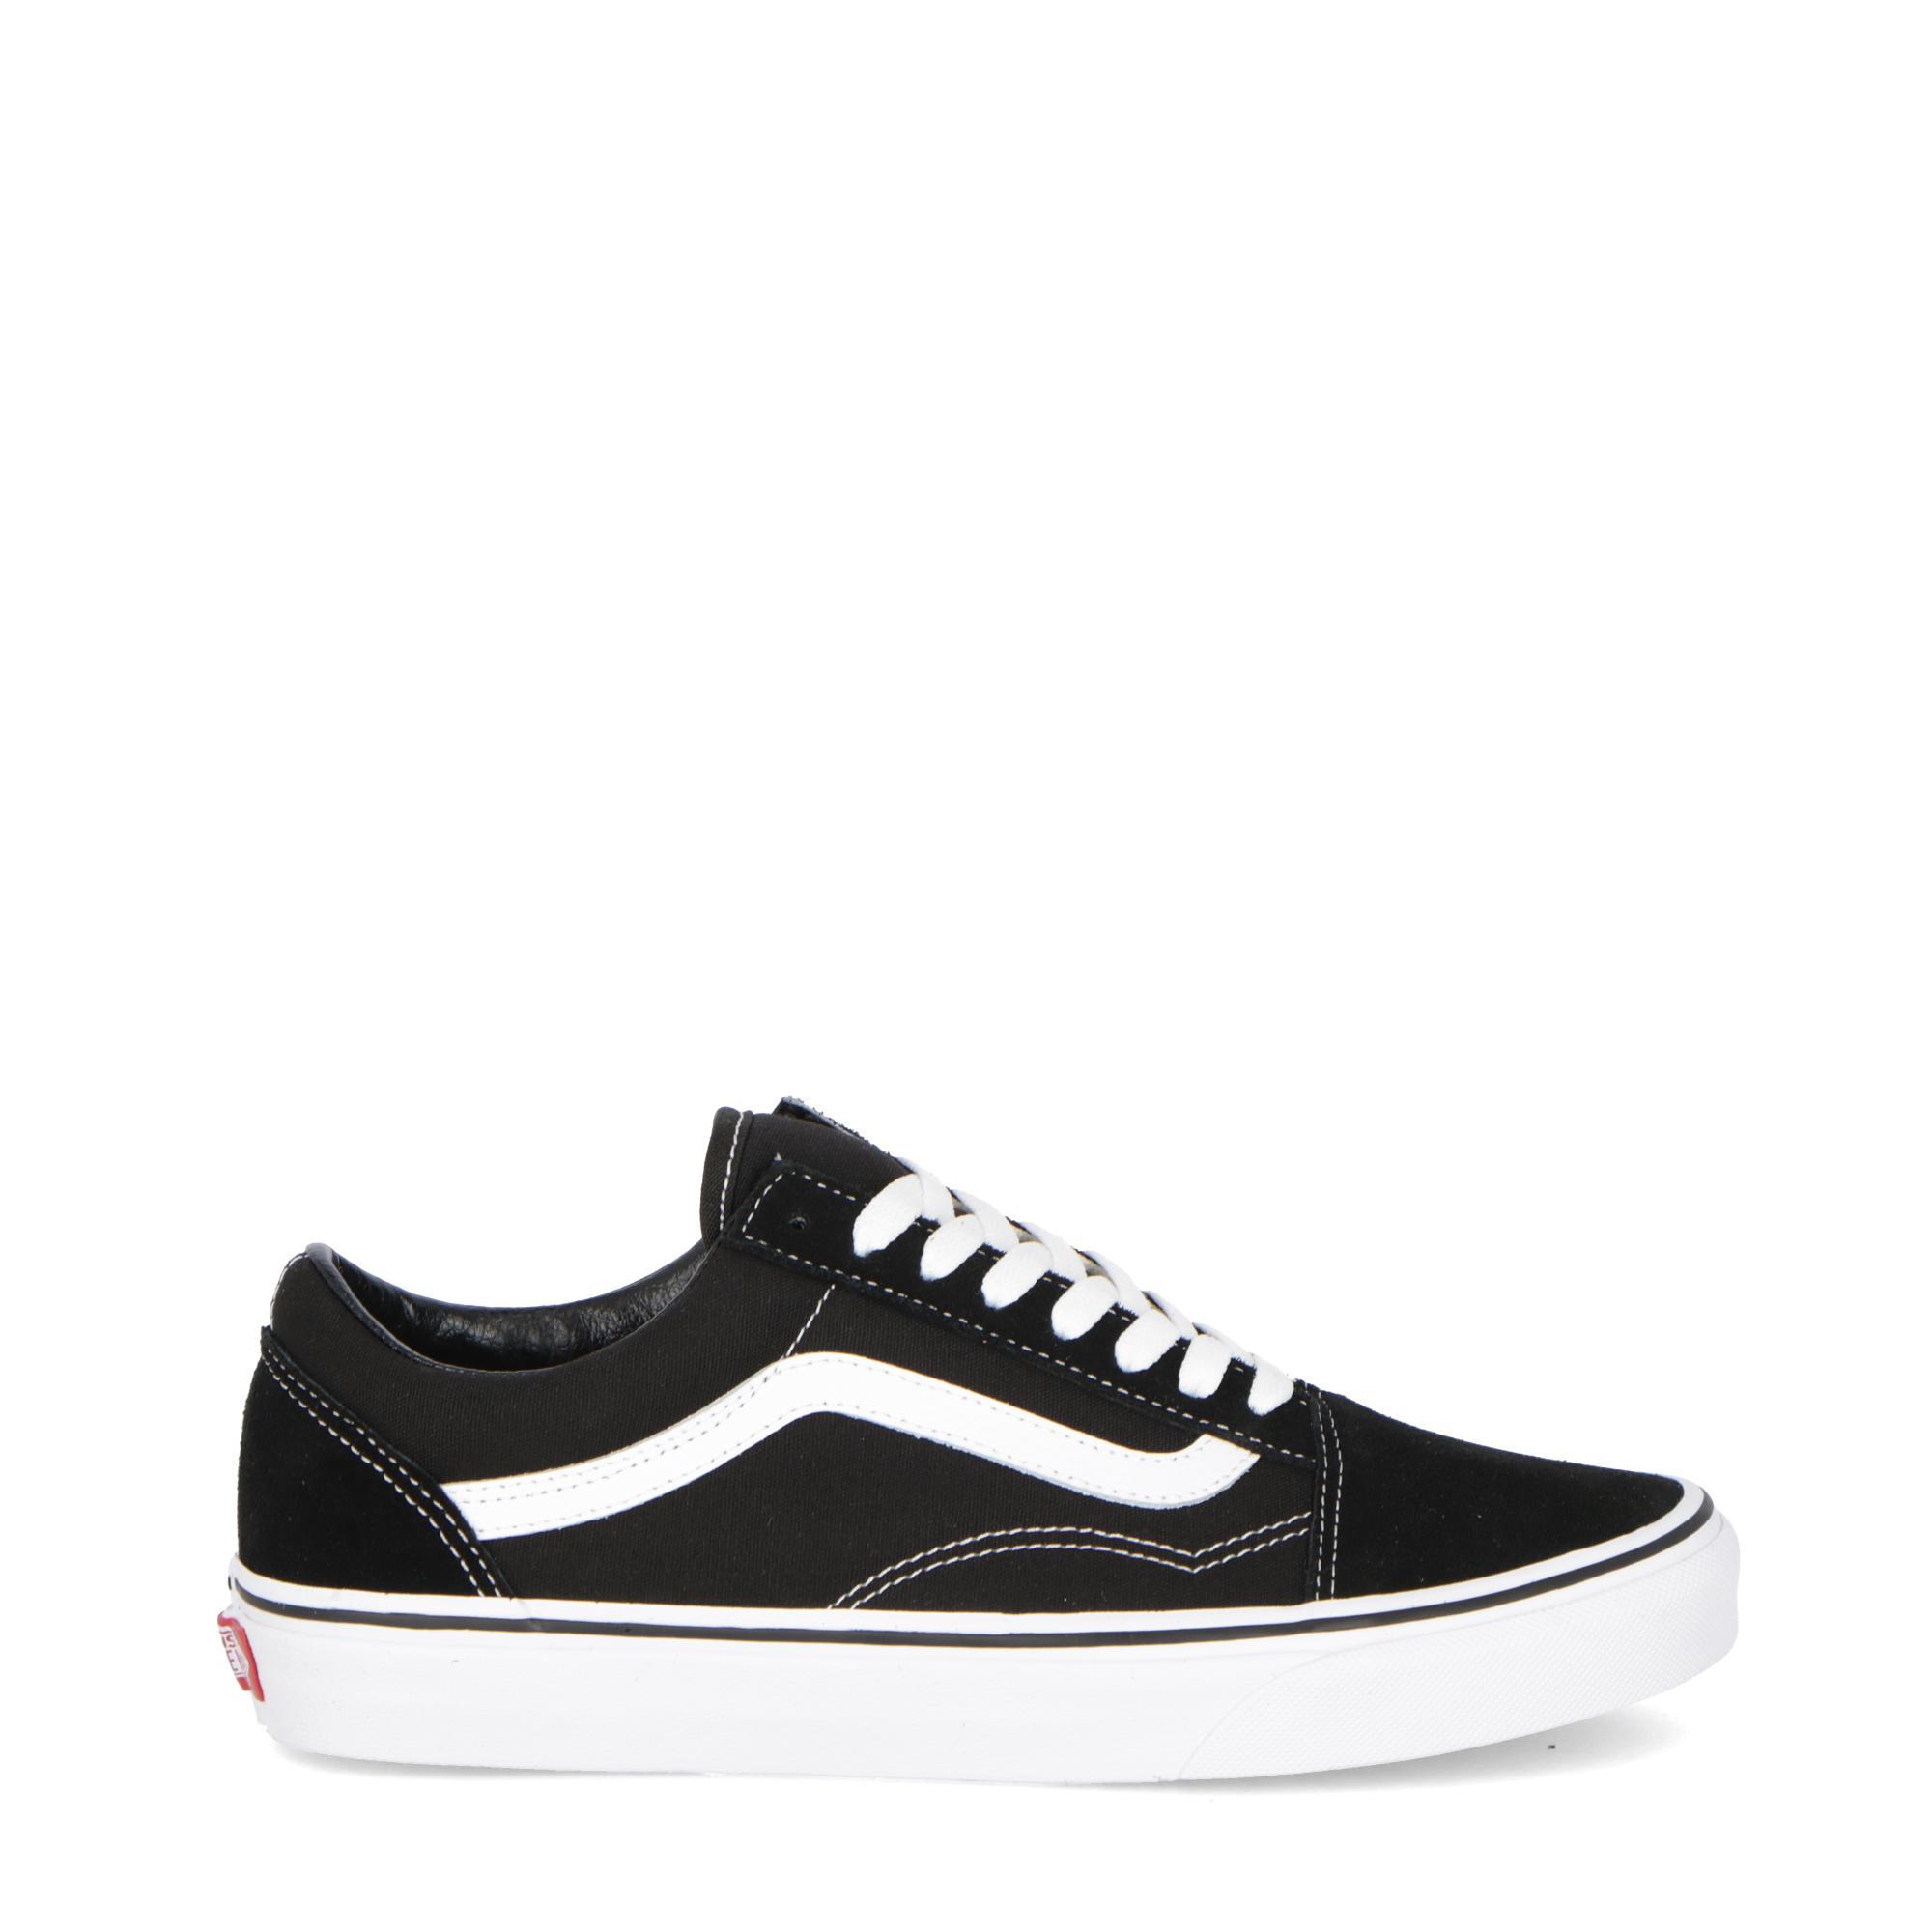 Vans Ua Old Skool<br/> Black white